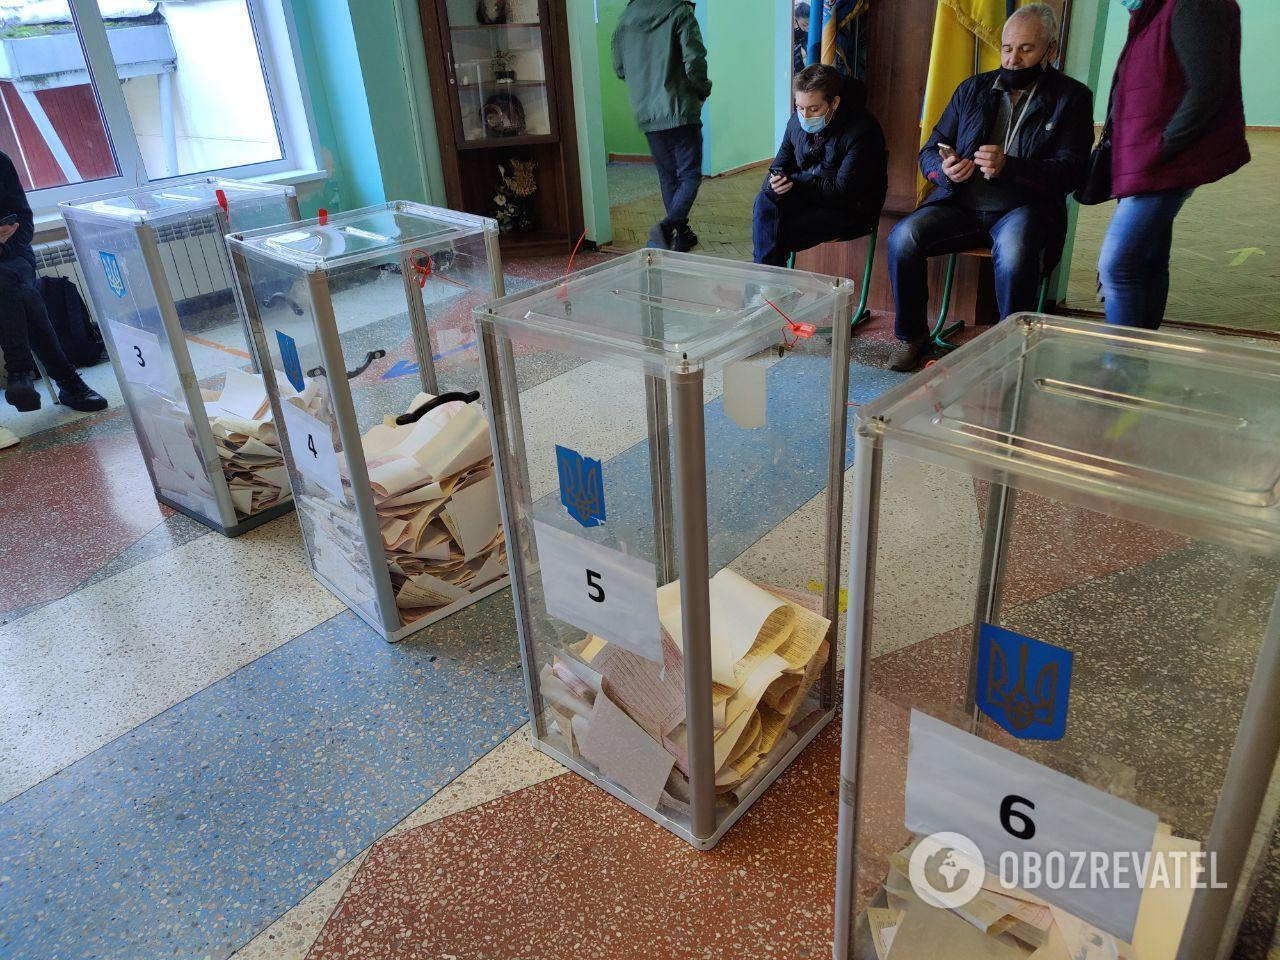 Явка на виборах станом на 12:00 становила 13,5%